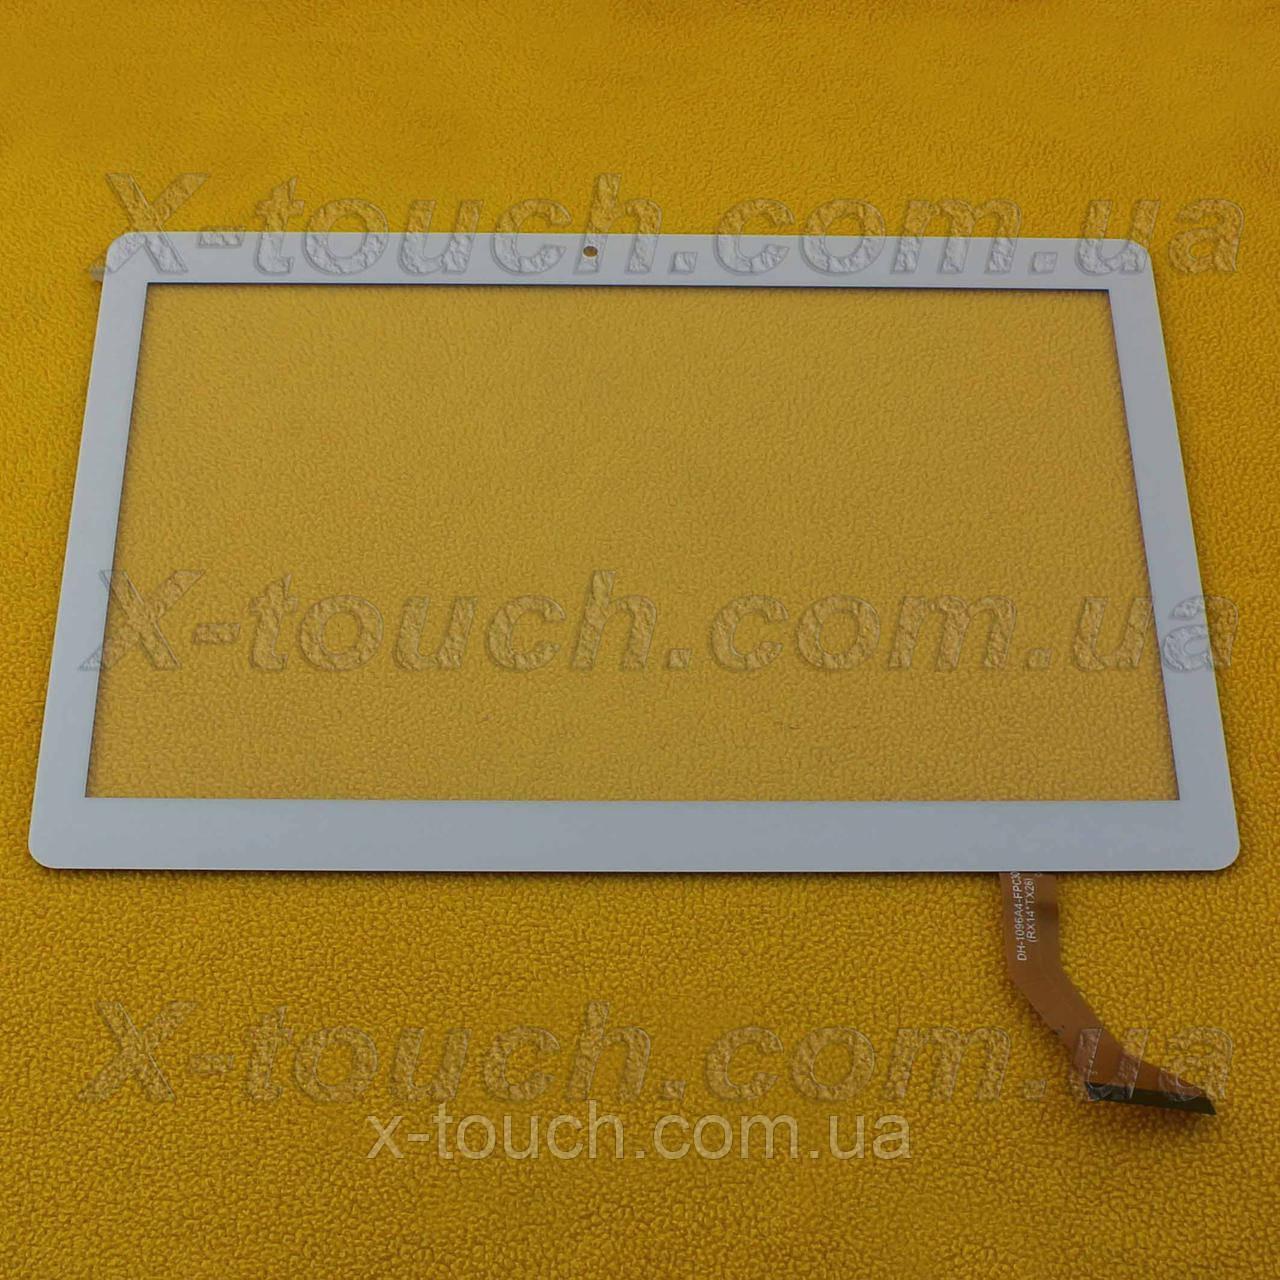 Cенсор, тачскрин MJK-0591-FPC, белого цвета.